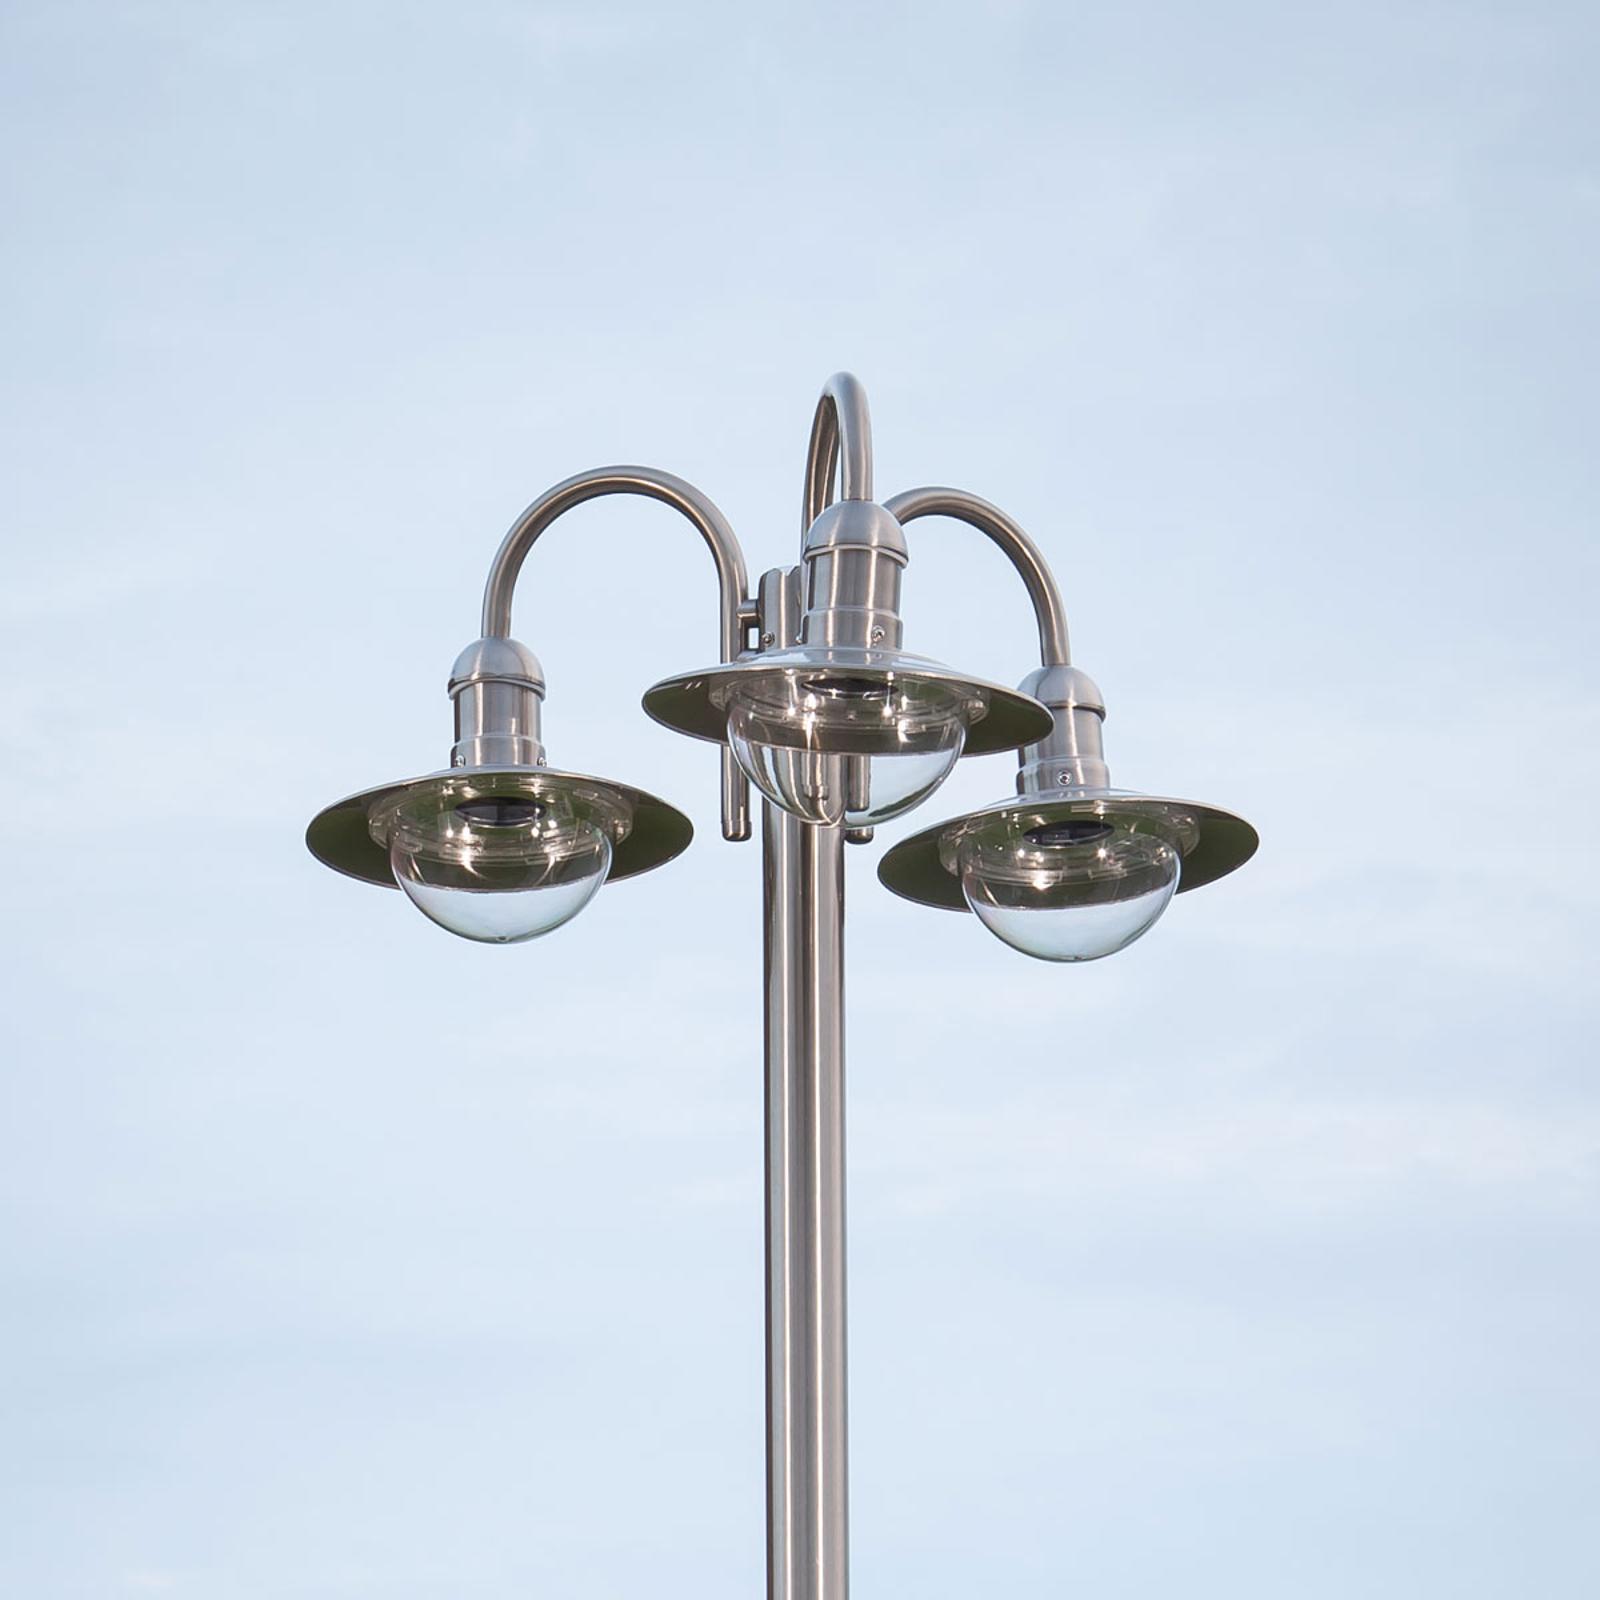 Kandelaber Damion av rustfritt stål, 3 lys